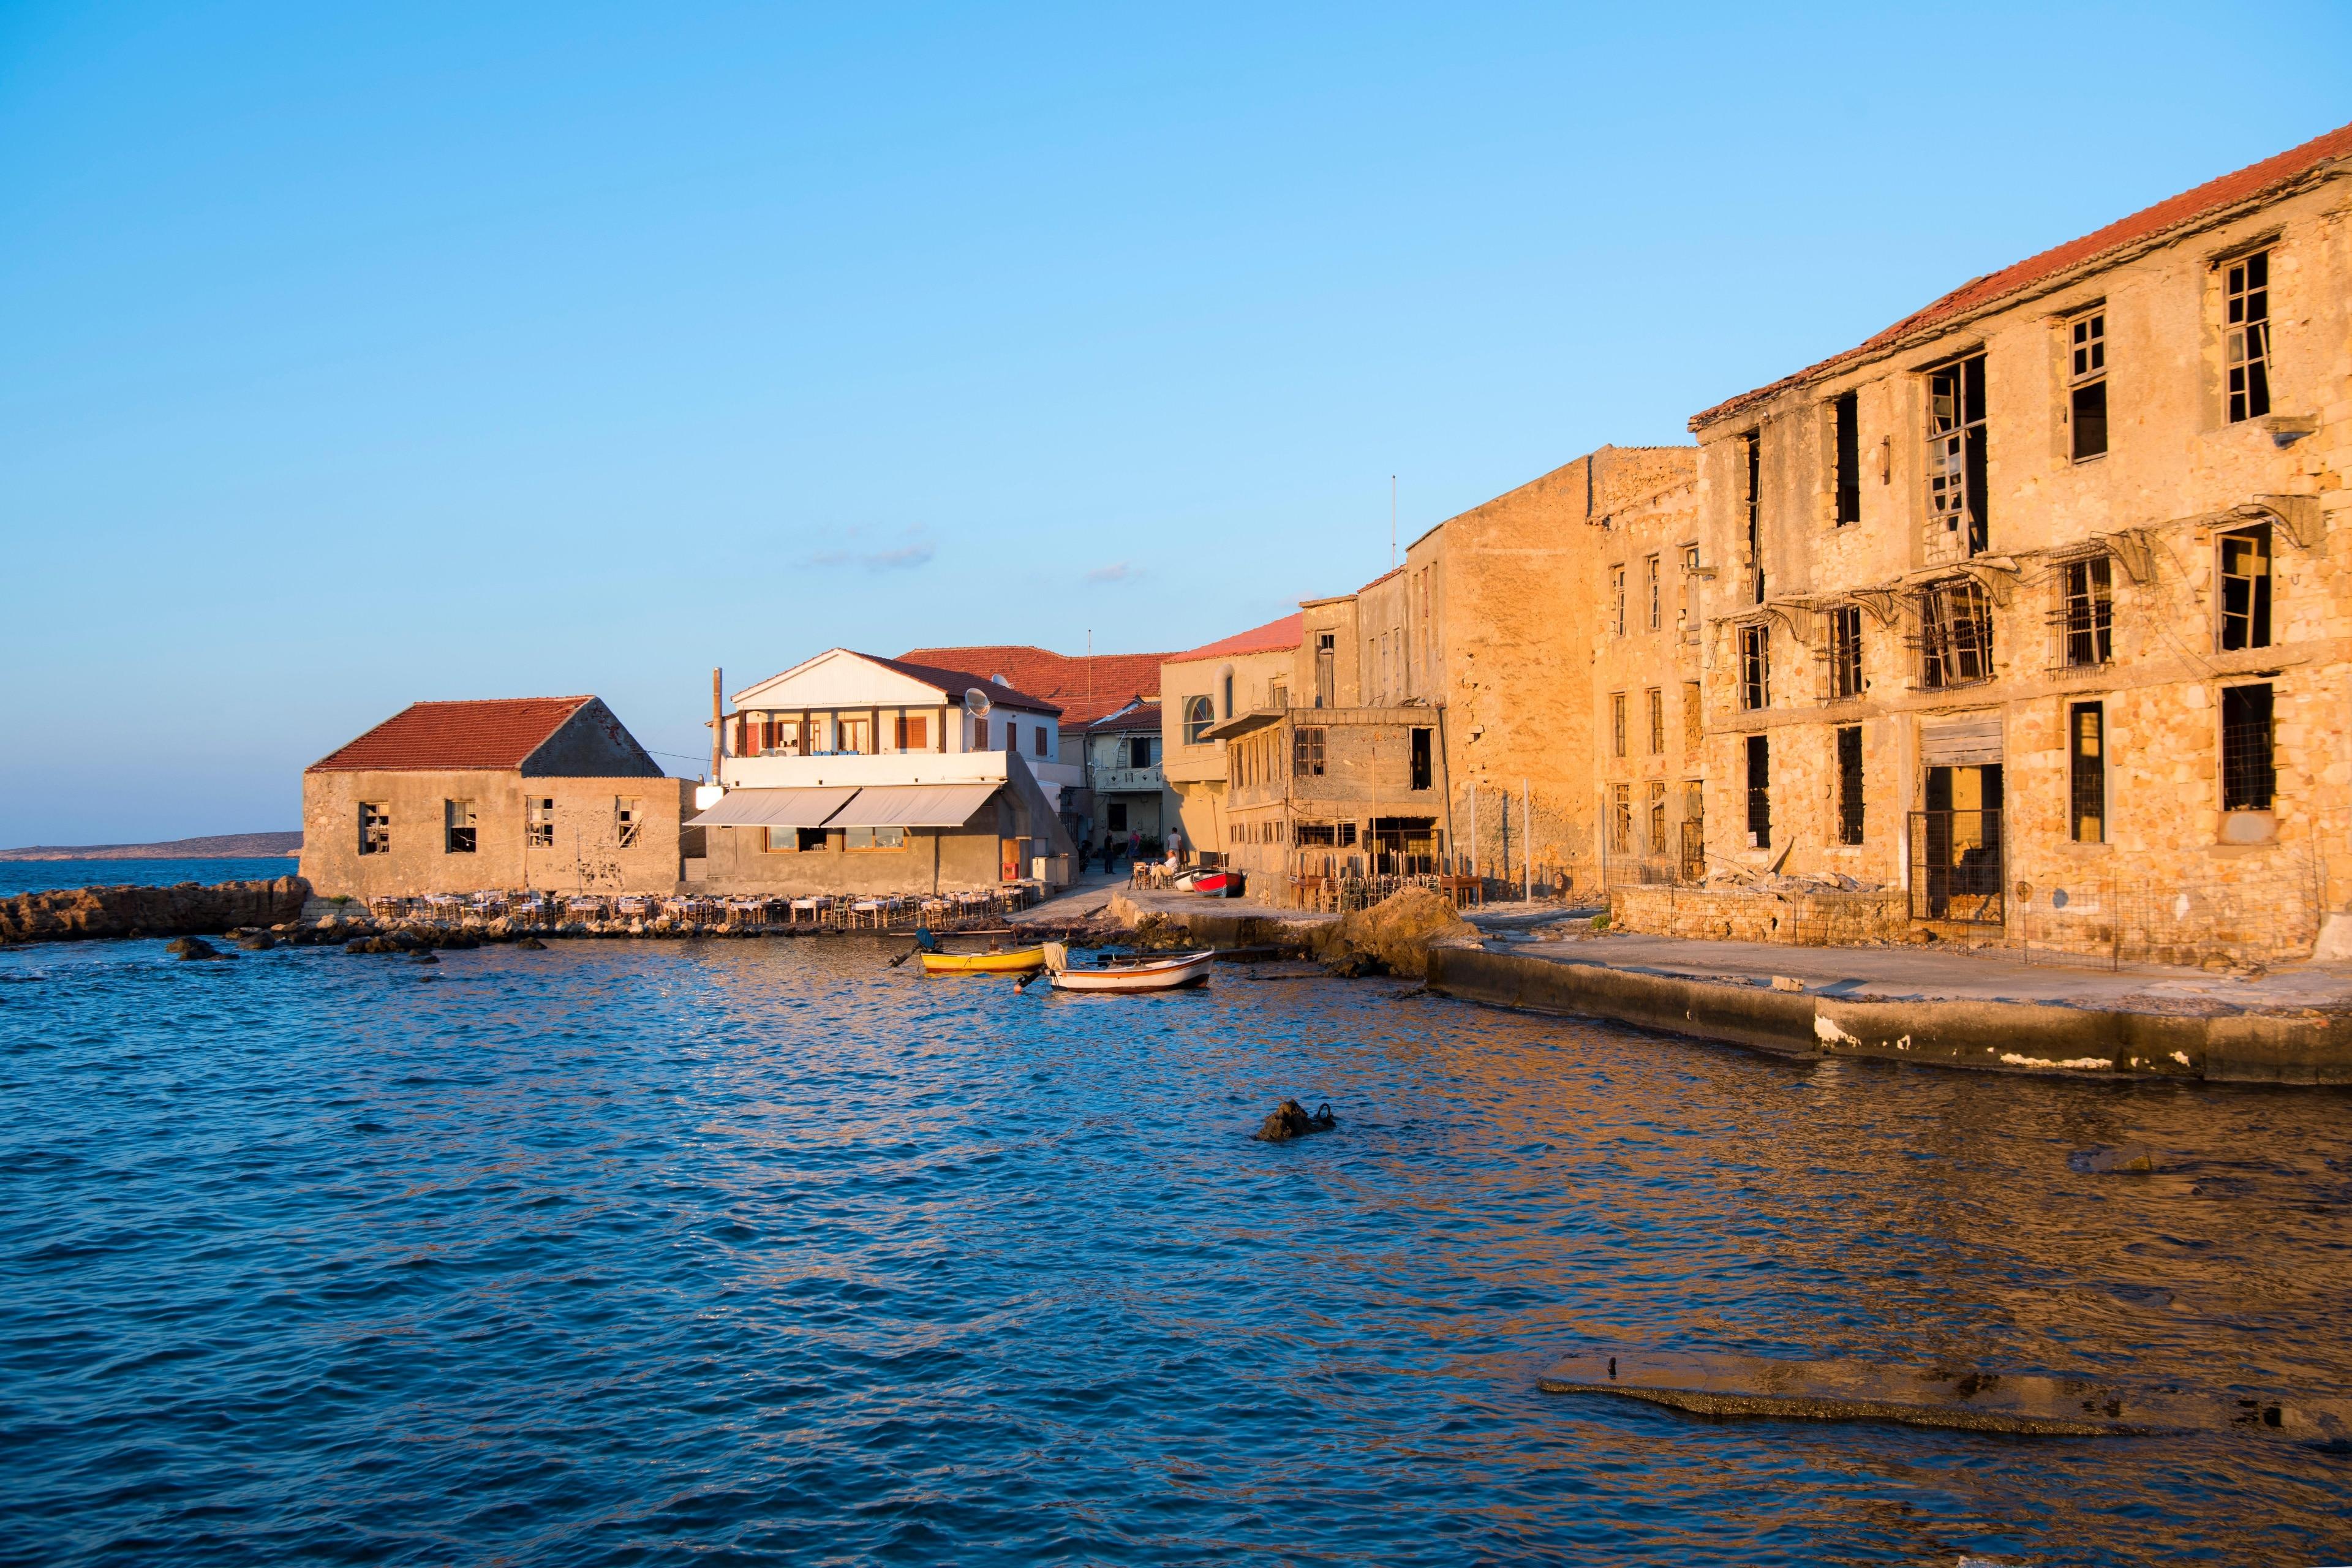 Halepa, Chania, Crete, Greece